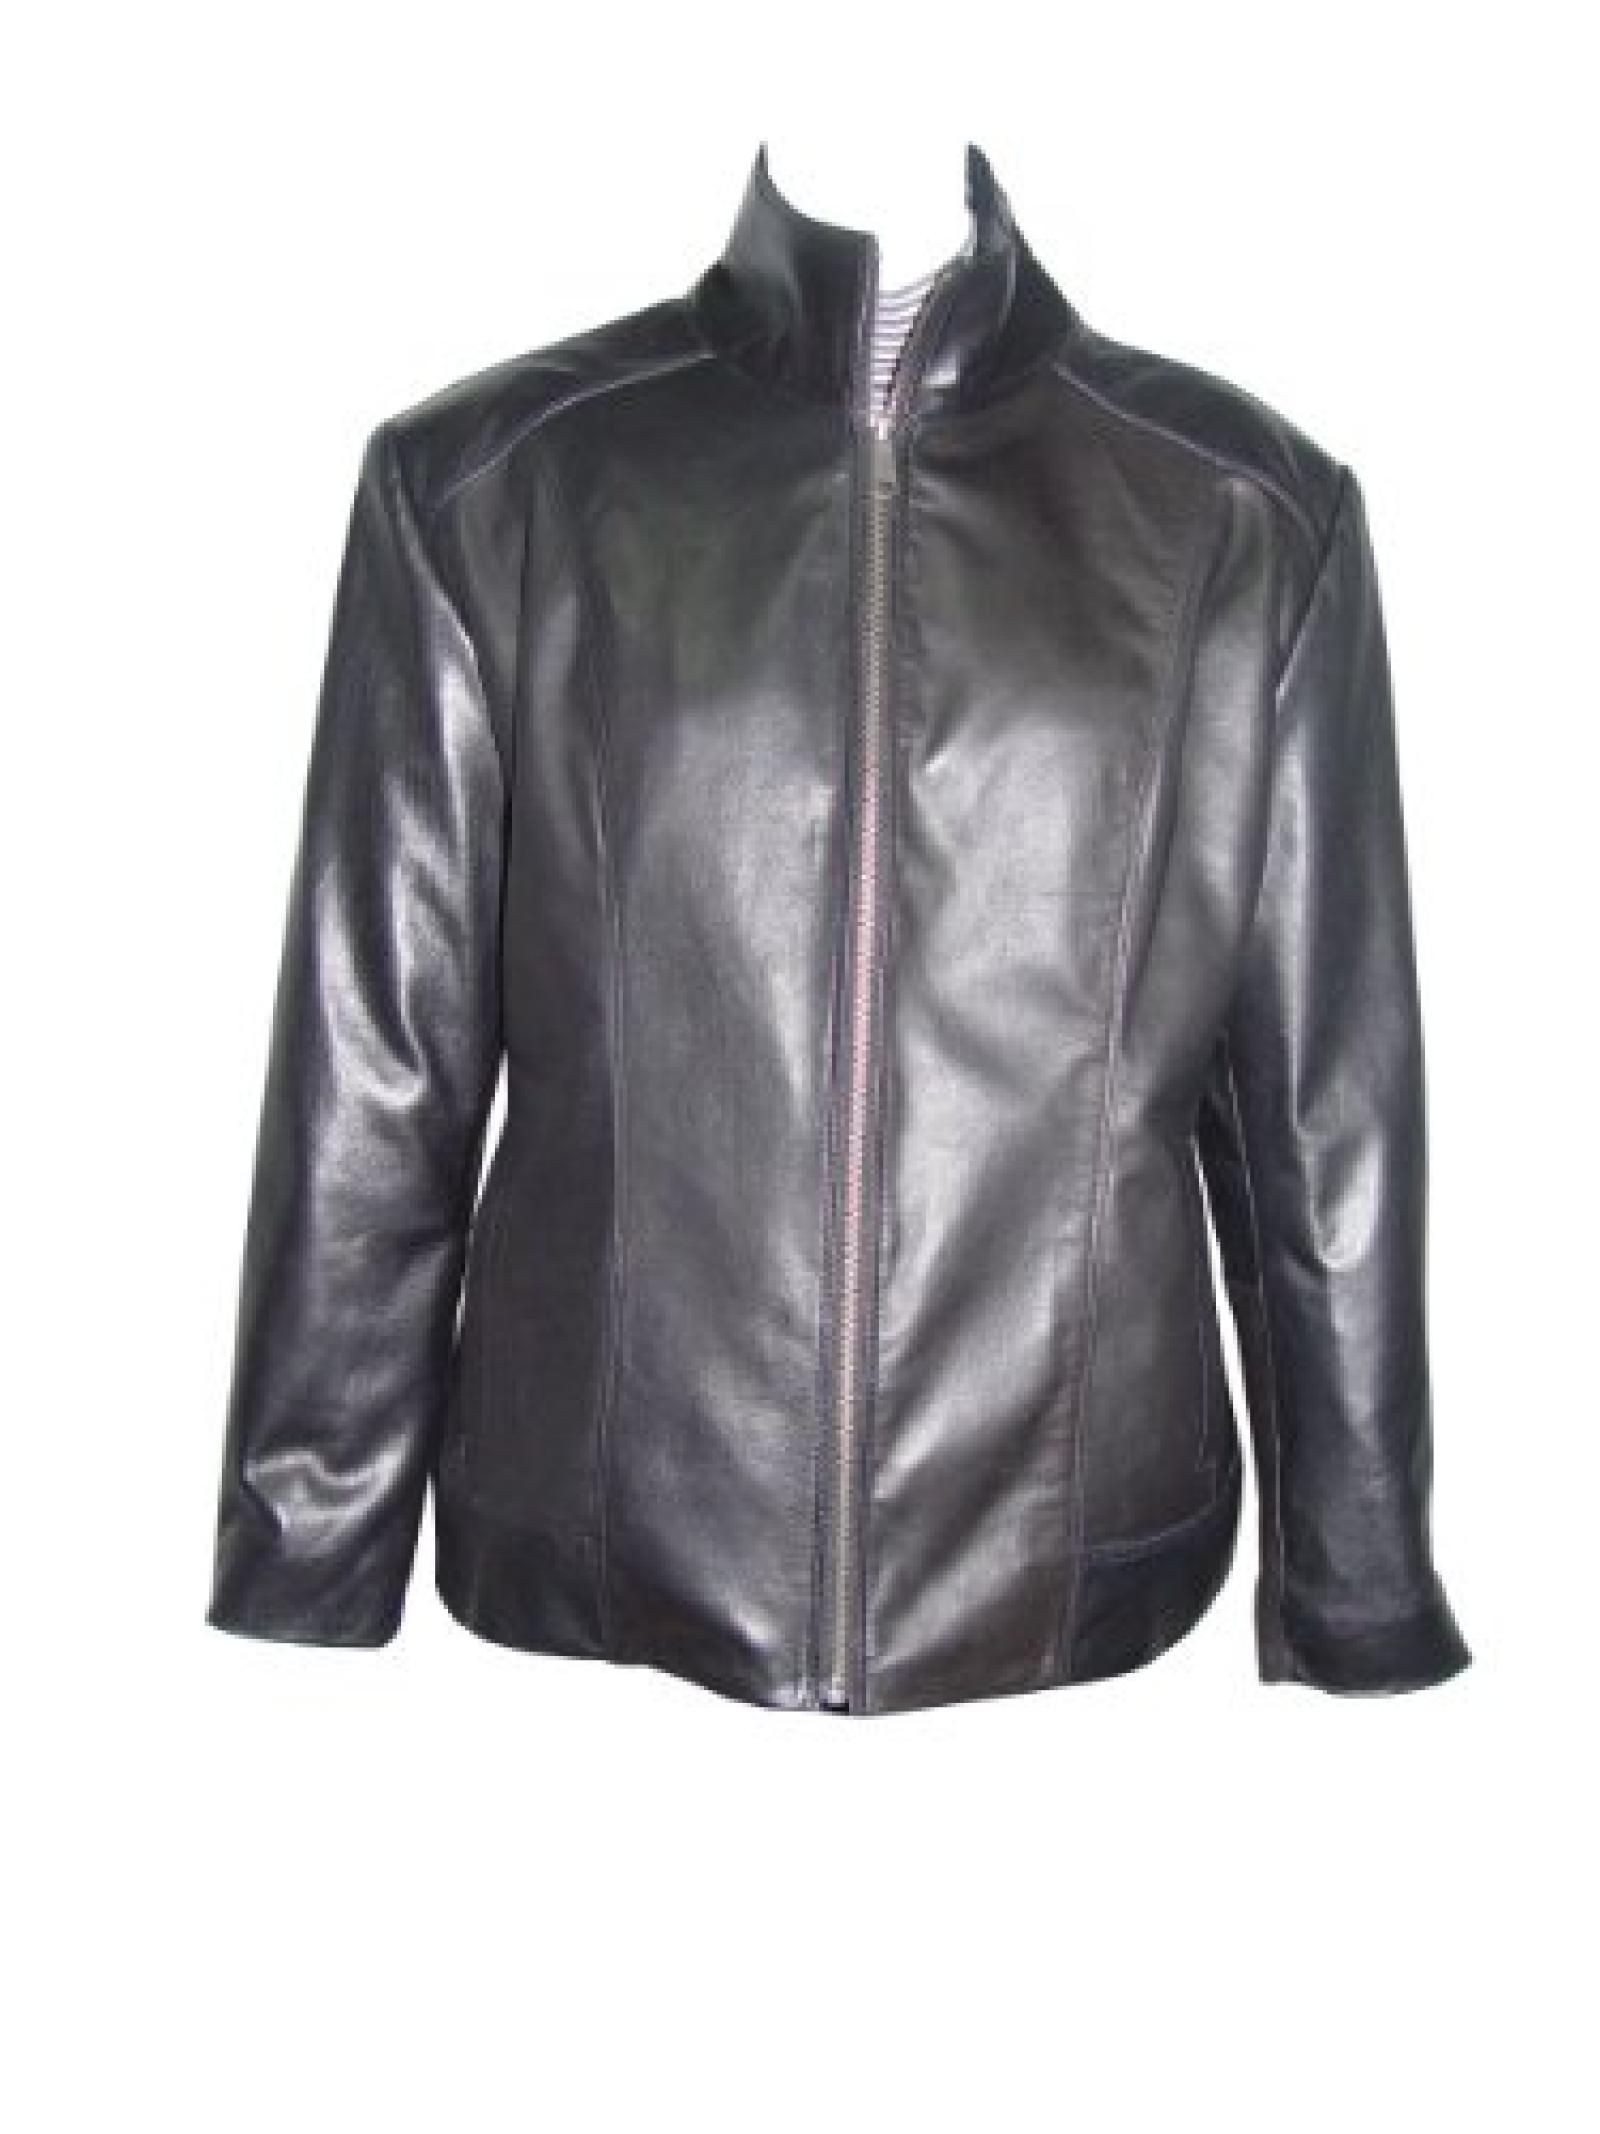 Nettailor Women PETITE SZ 4198 Soft Leather New Casual Biker Jacket